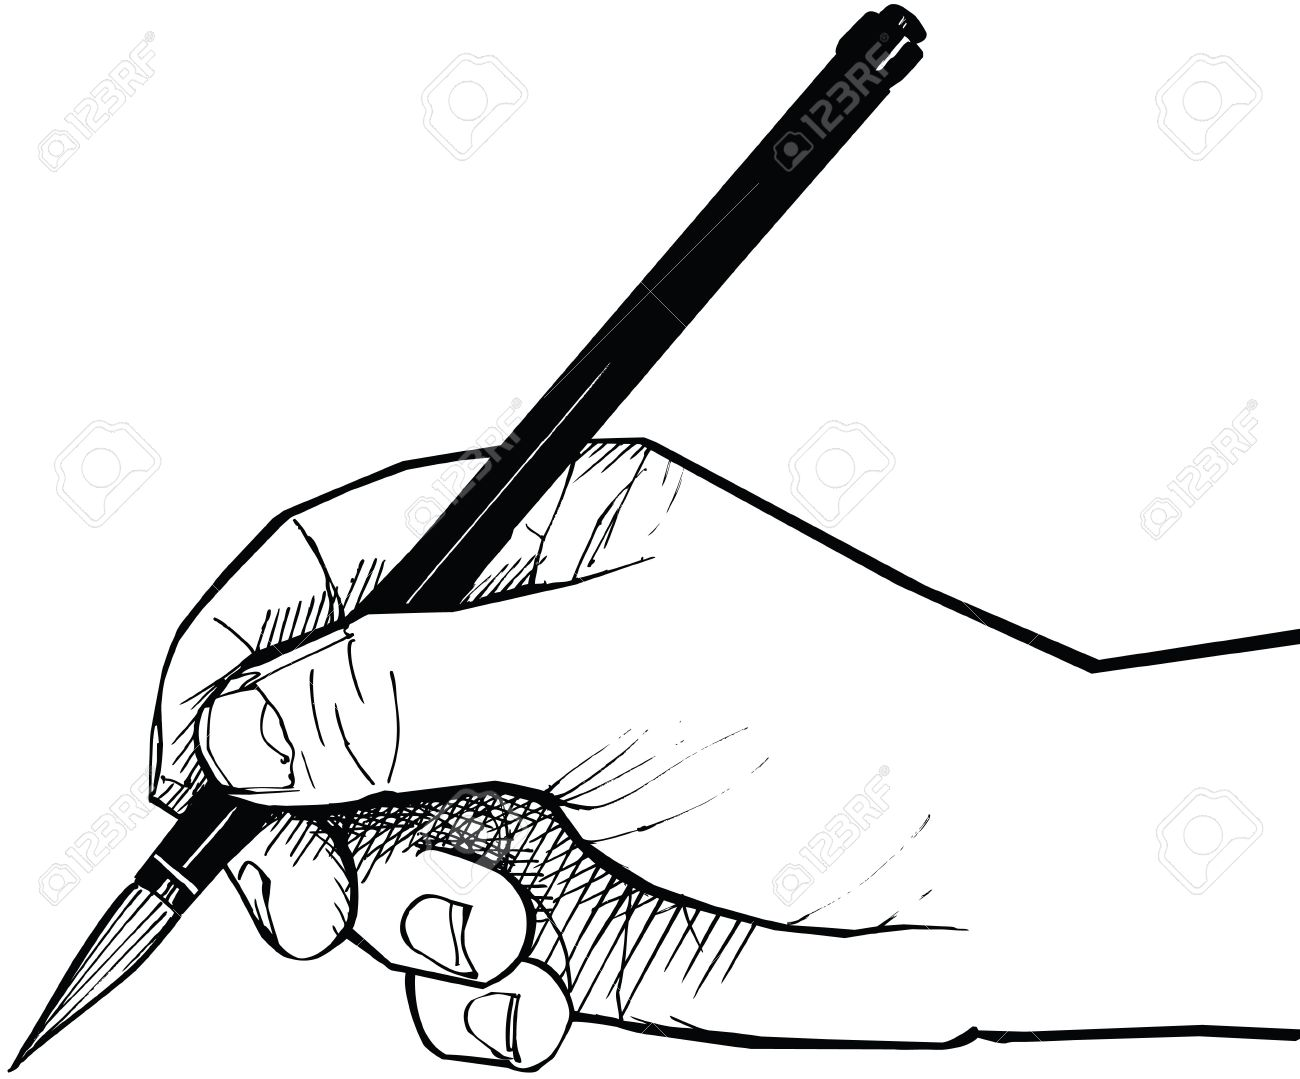 Drawing at getdrawings com. Brush clipart sketch